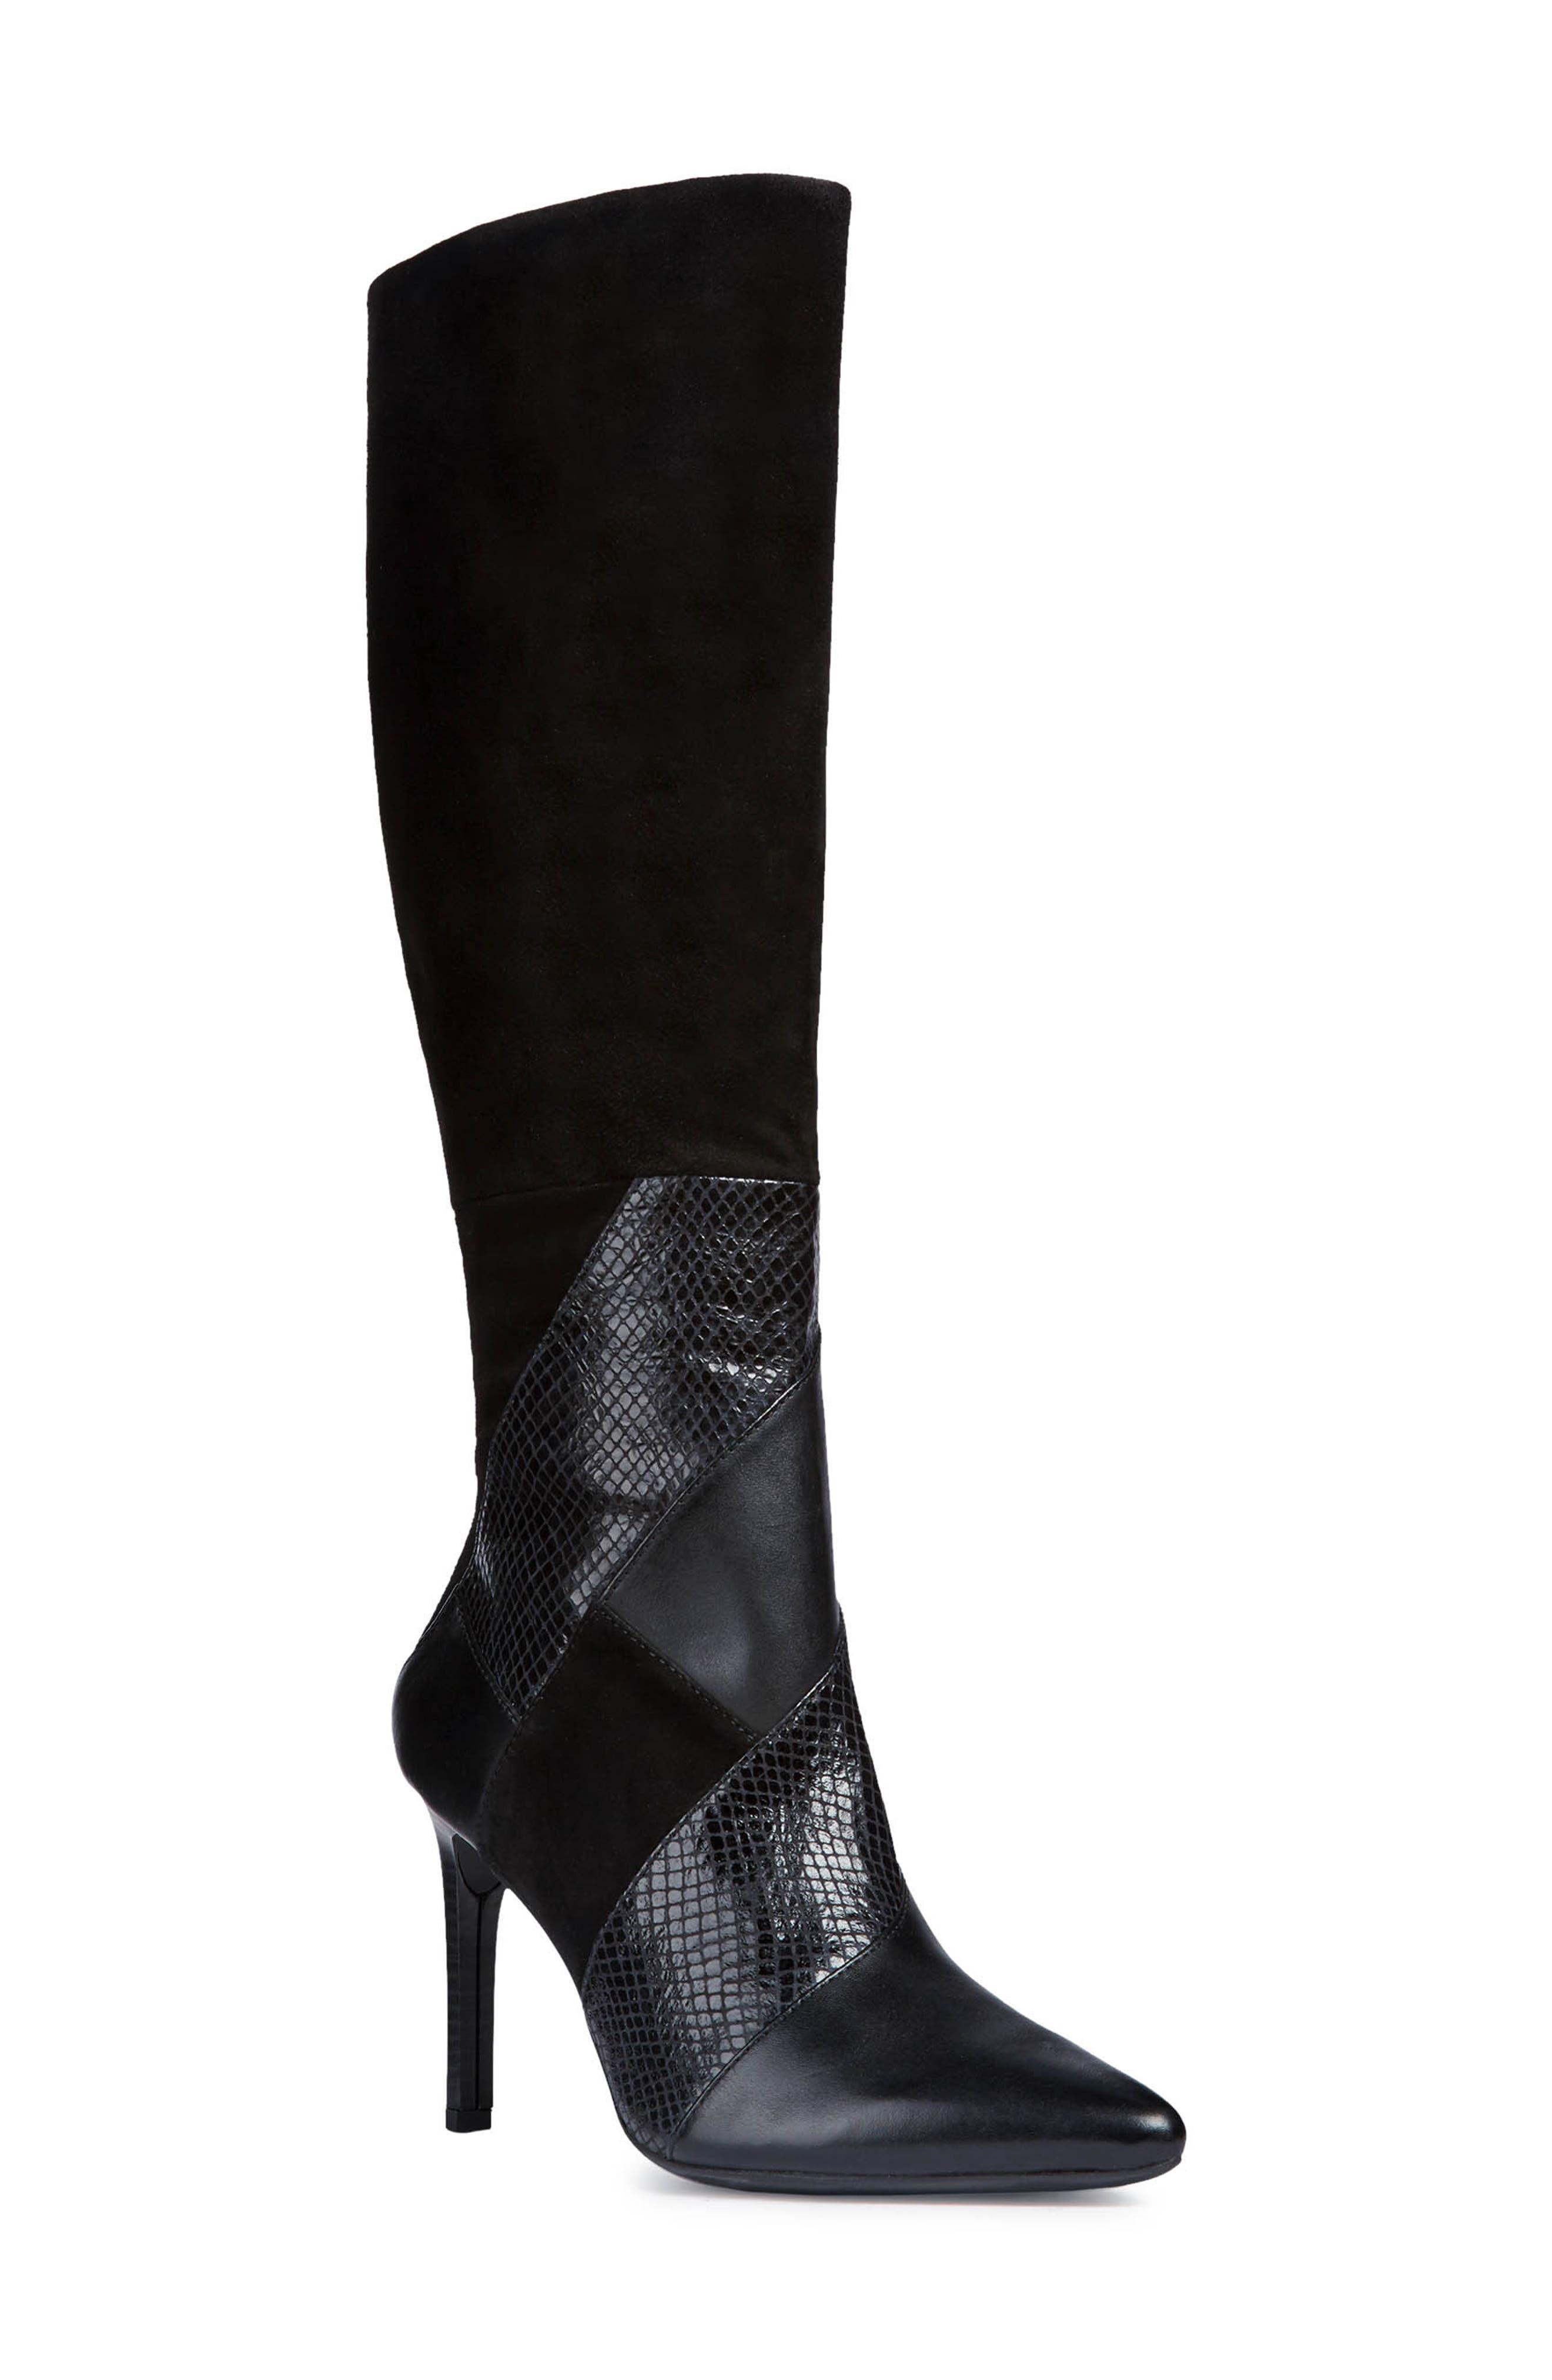 GEOX Faviola Knee High Boot, Main, color, BLACK LEATHER